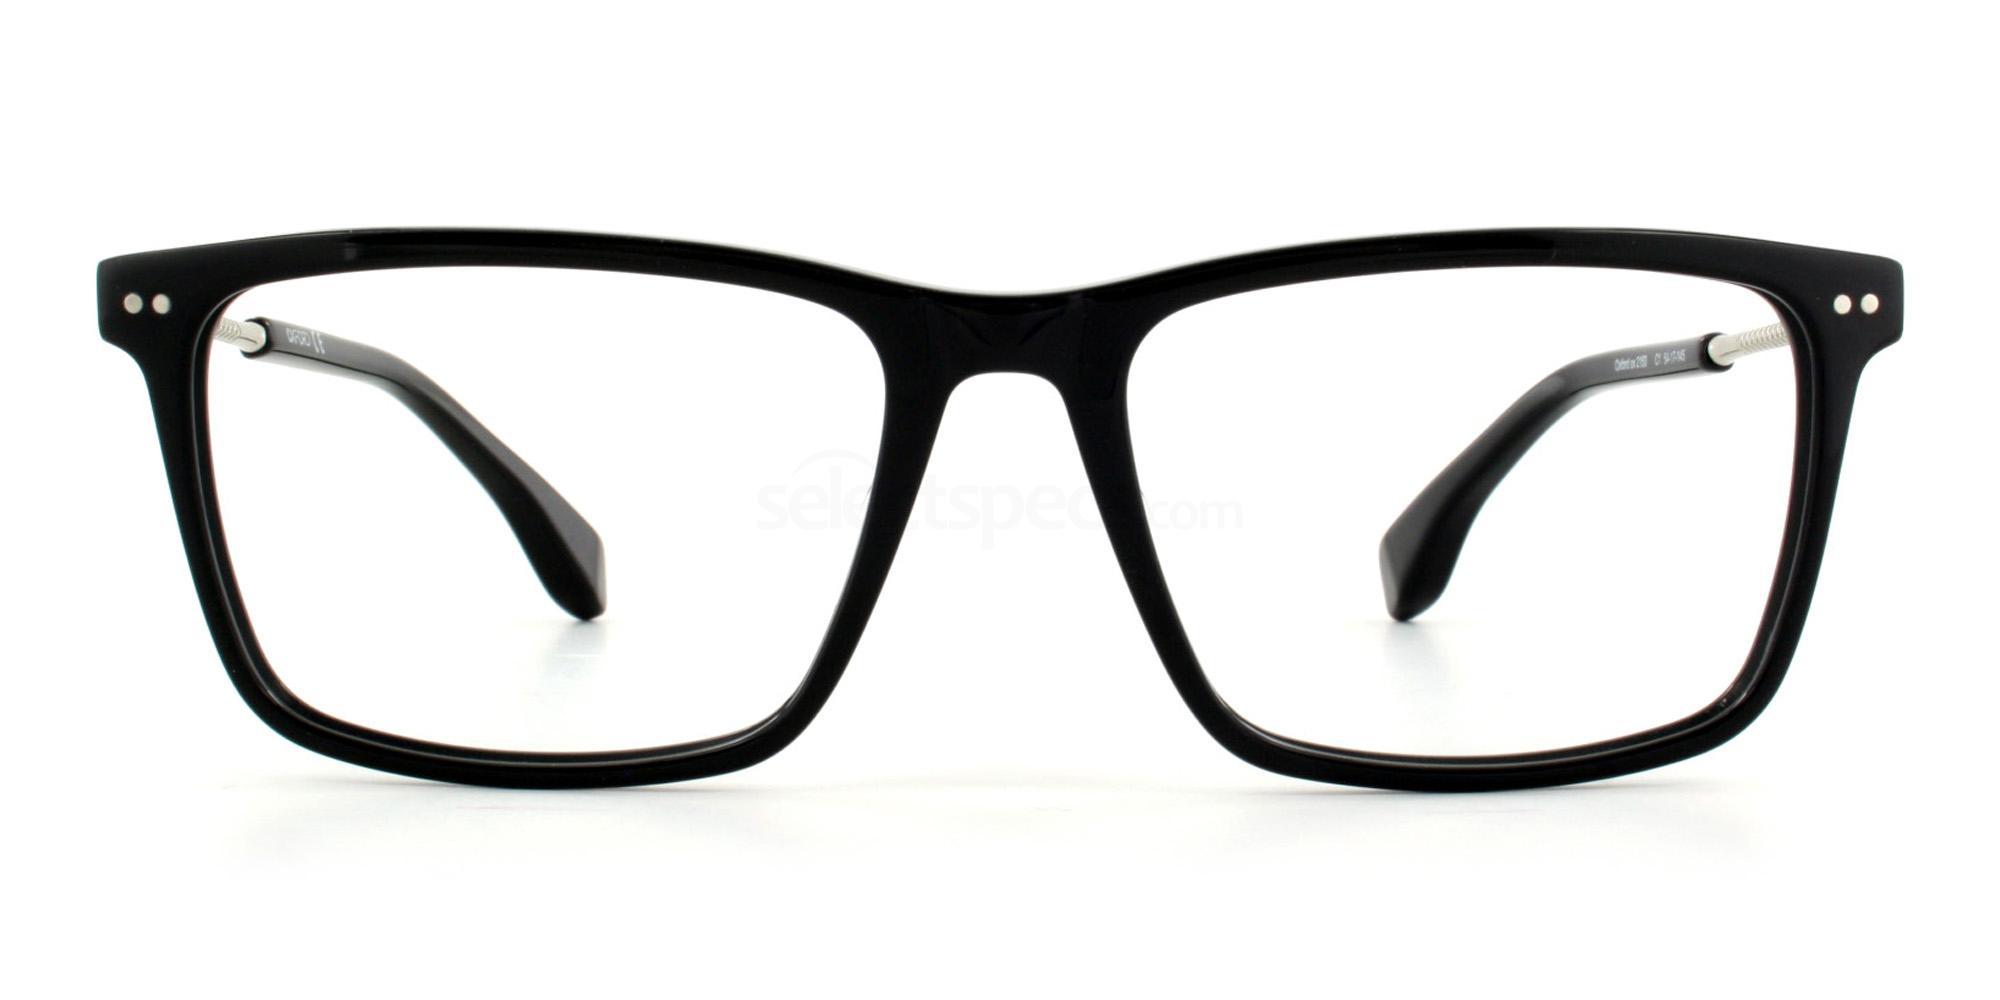 C1 OXF 2153 Glasses, Oxford